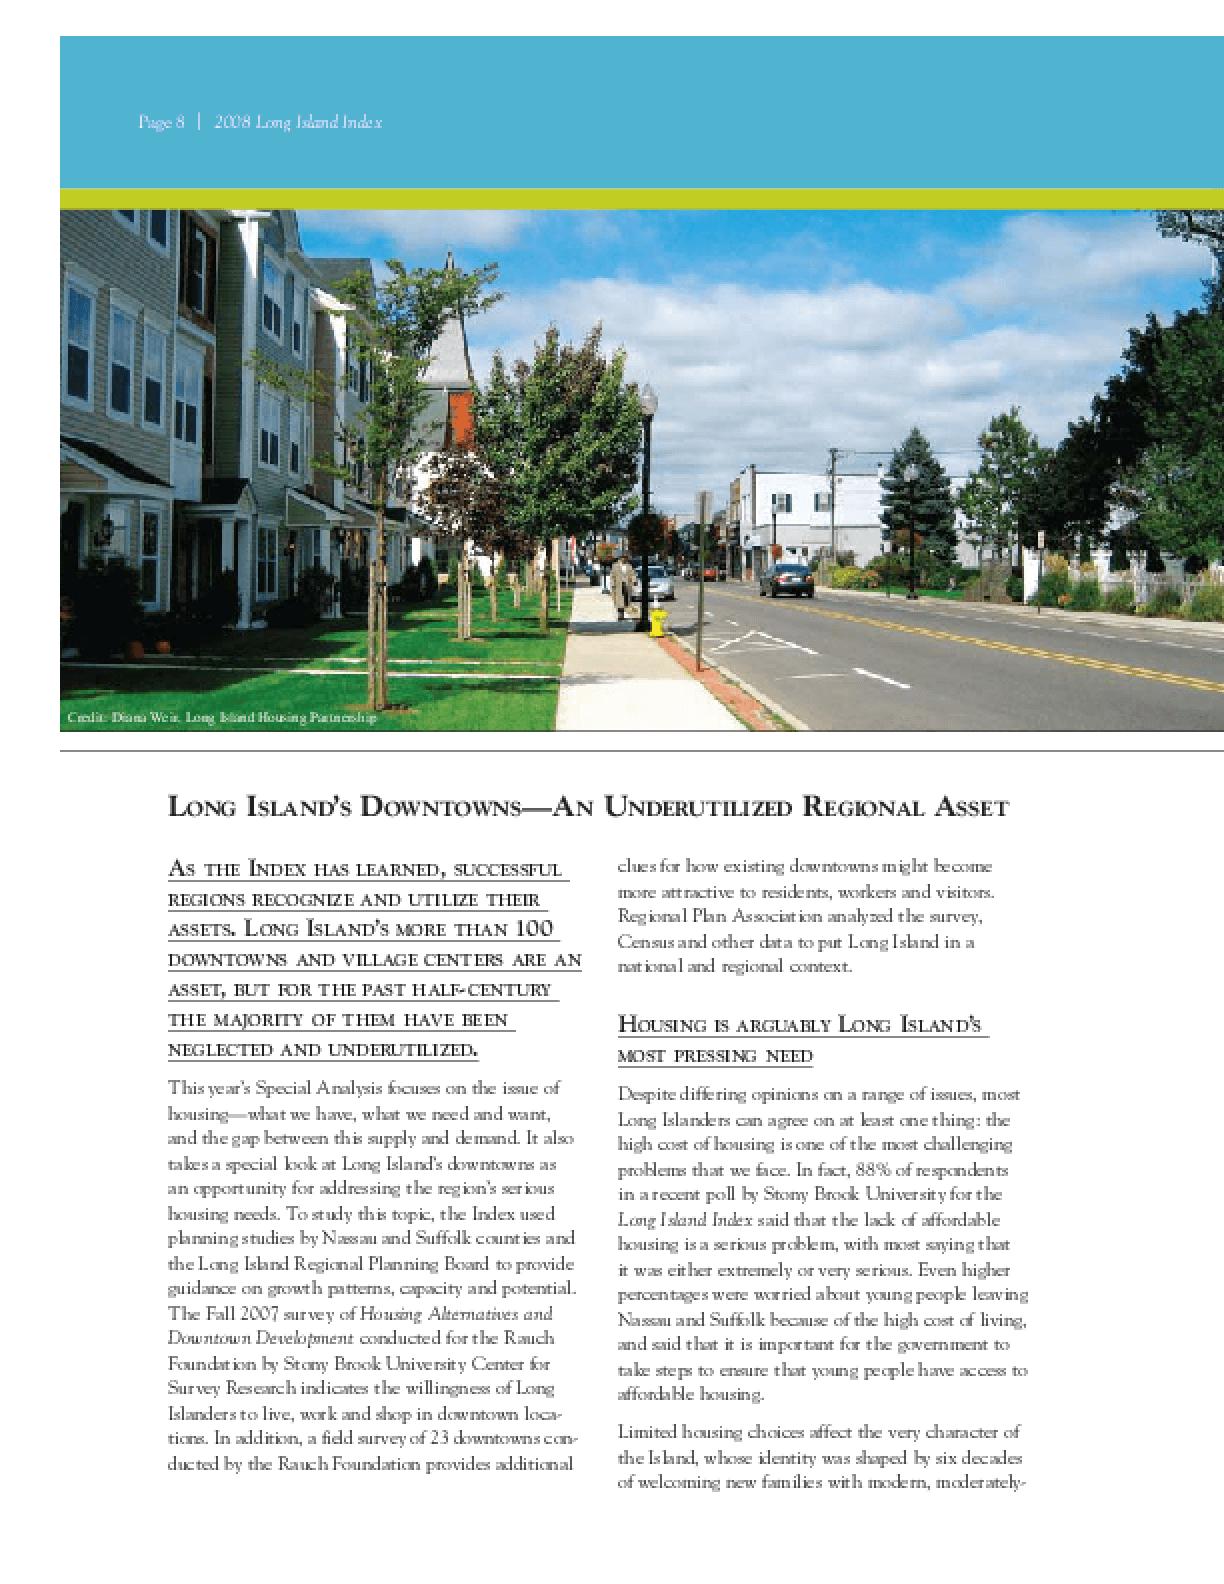 Long Island Index 2008